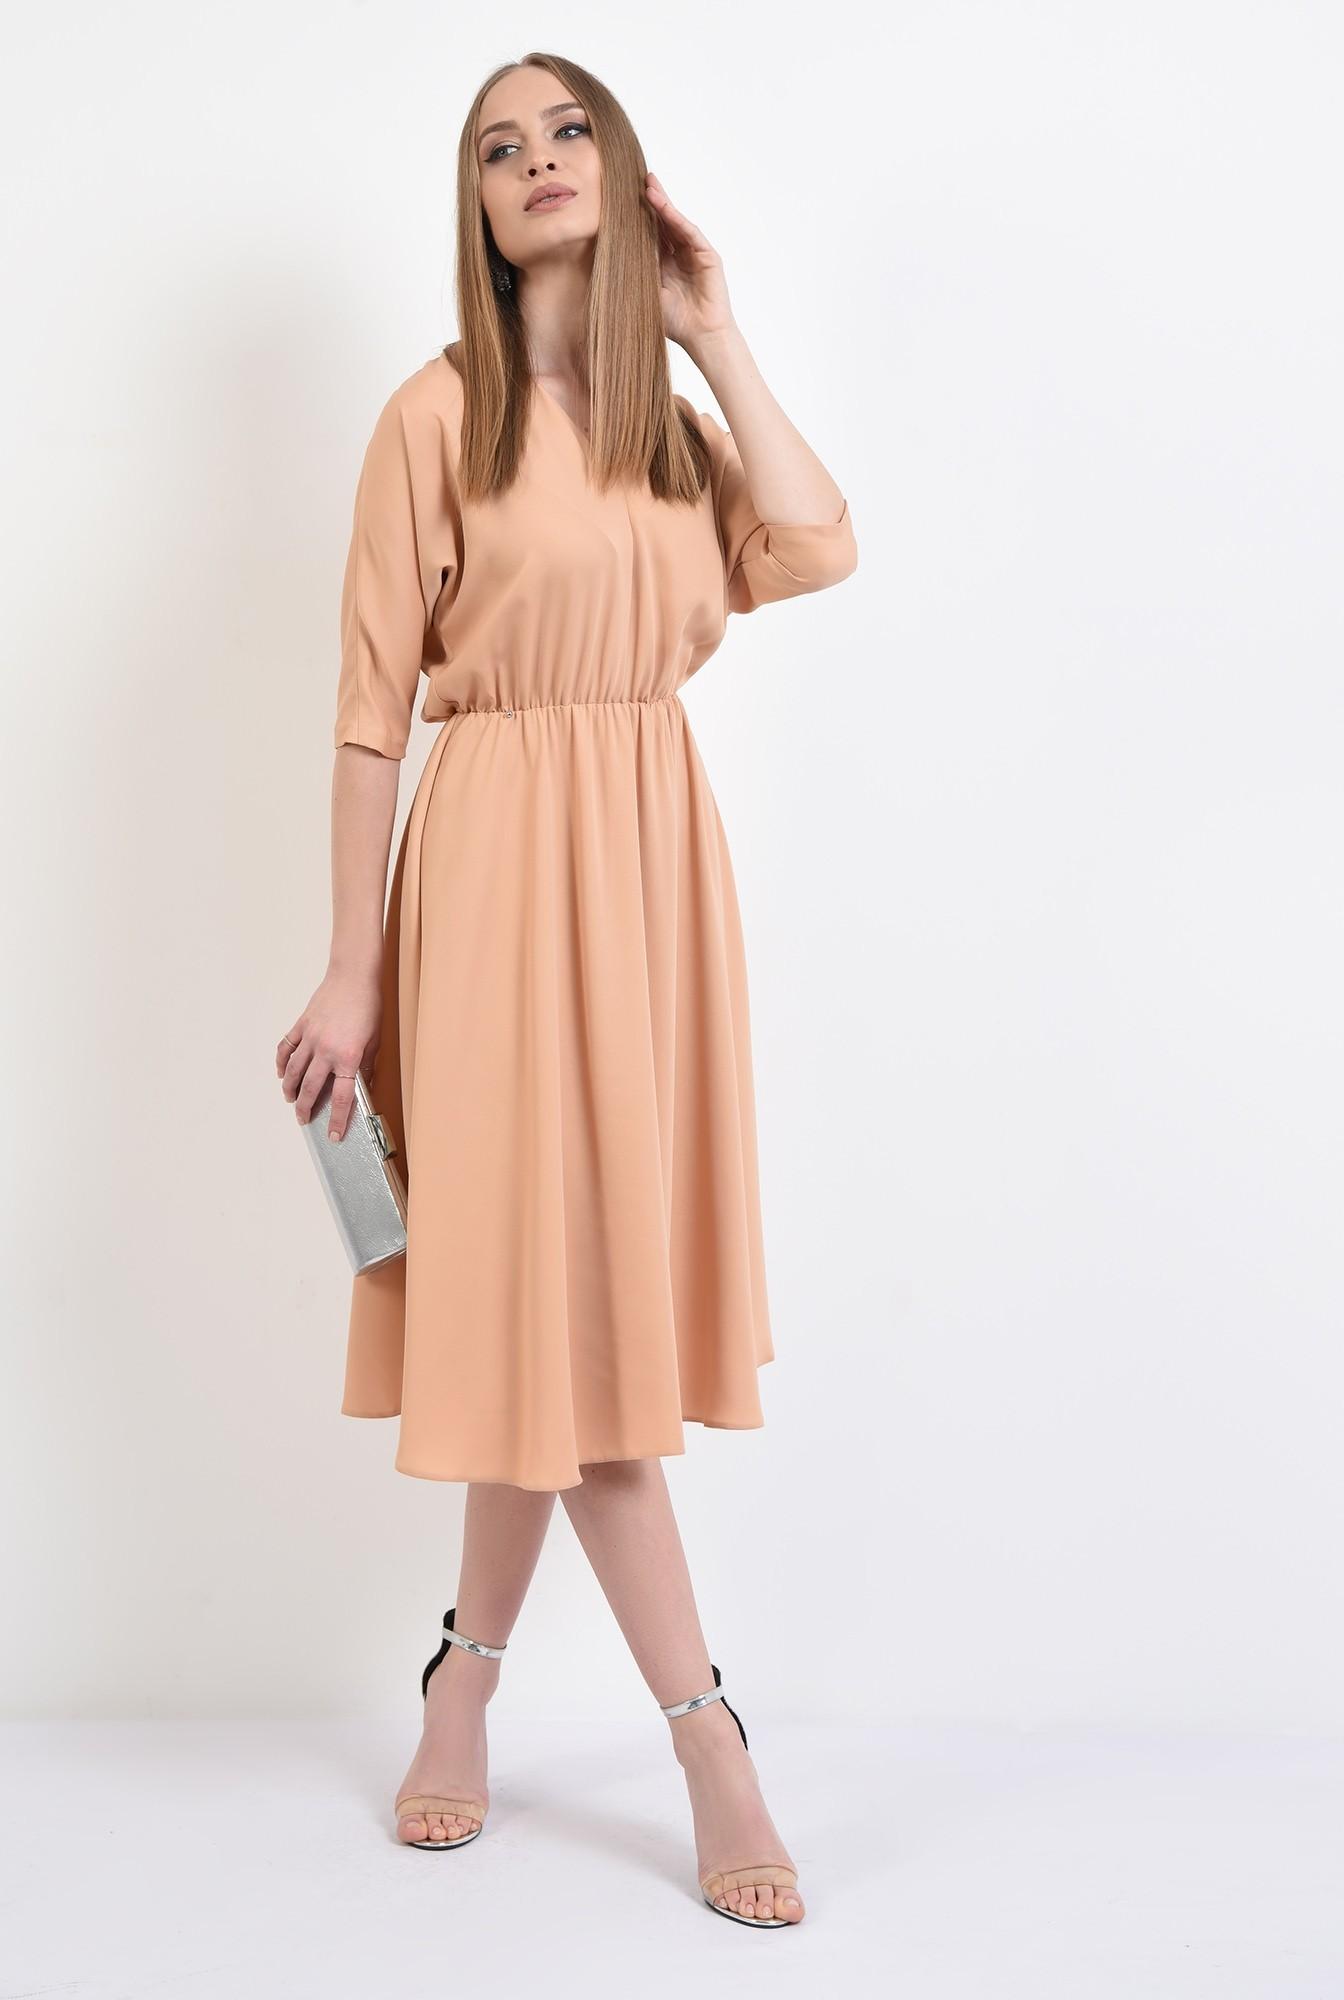 0 -  rochie eleganta, evazata, maneci liliac, croi clos, cu anchior, Poema